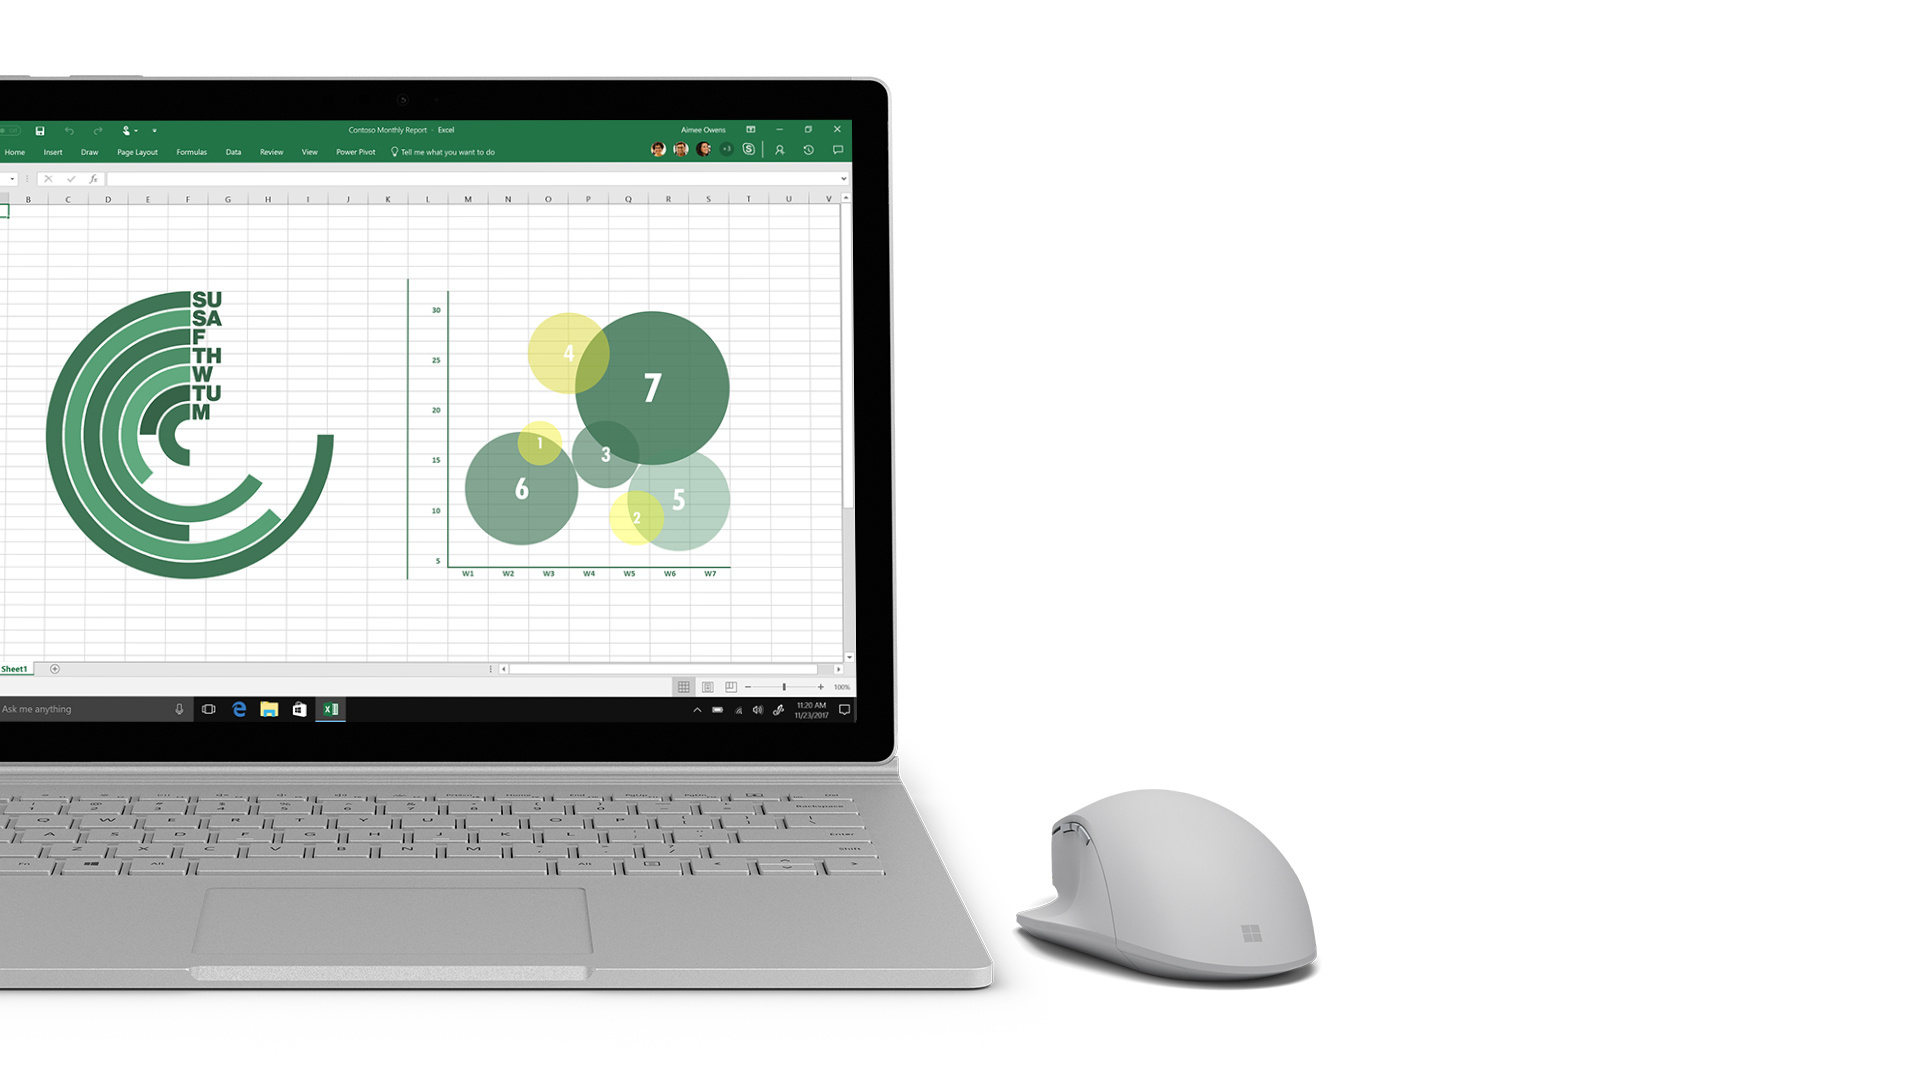 Surface 上の Excel スクリーンショット。